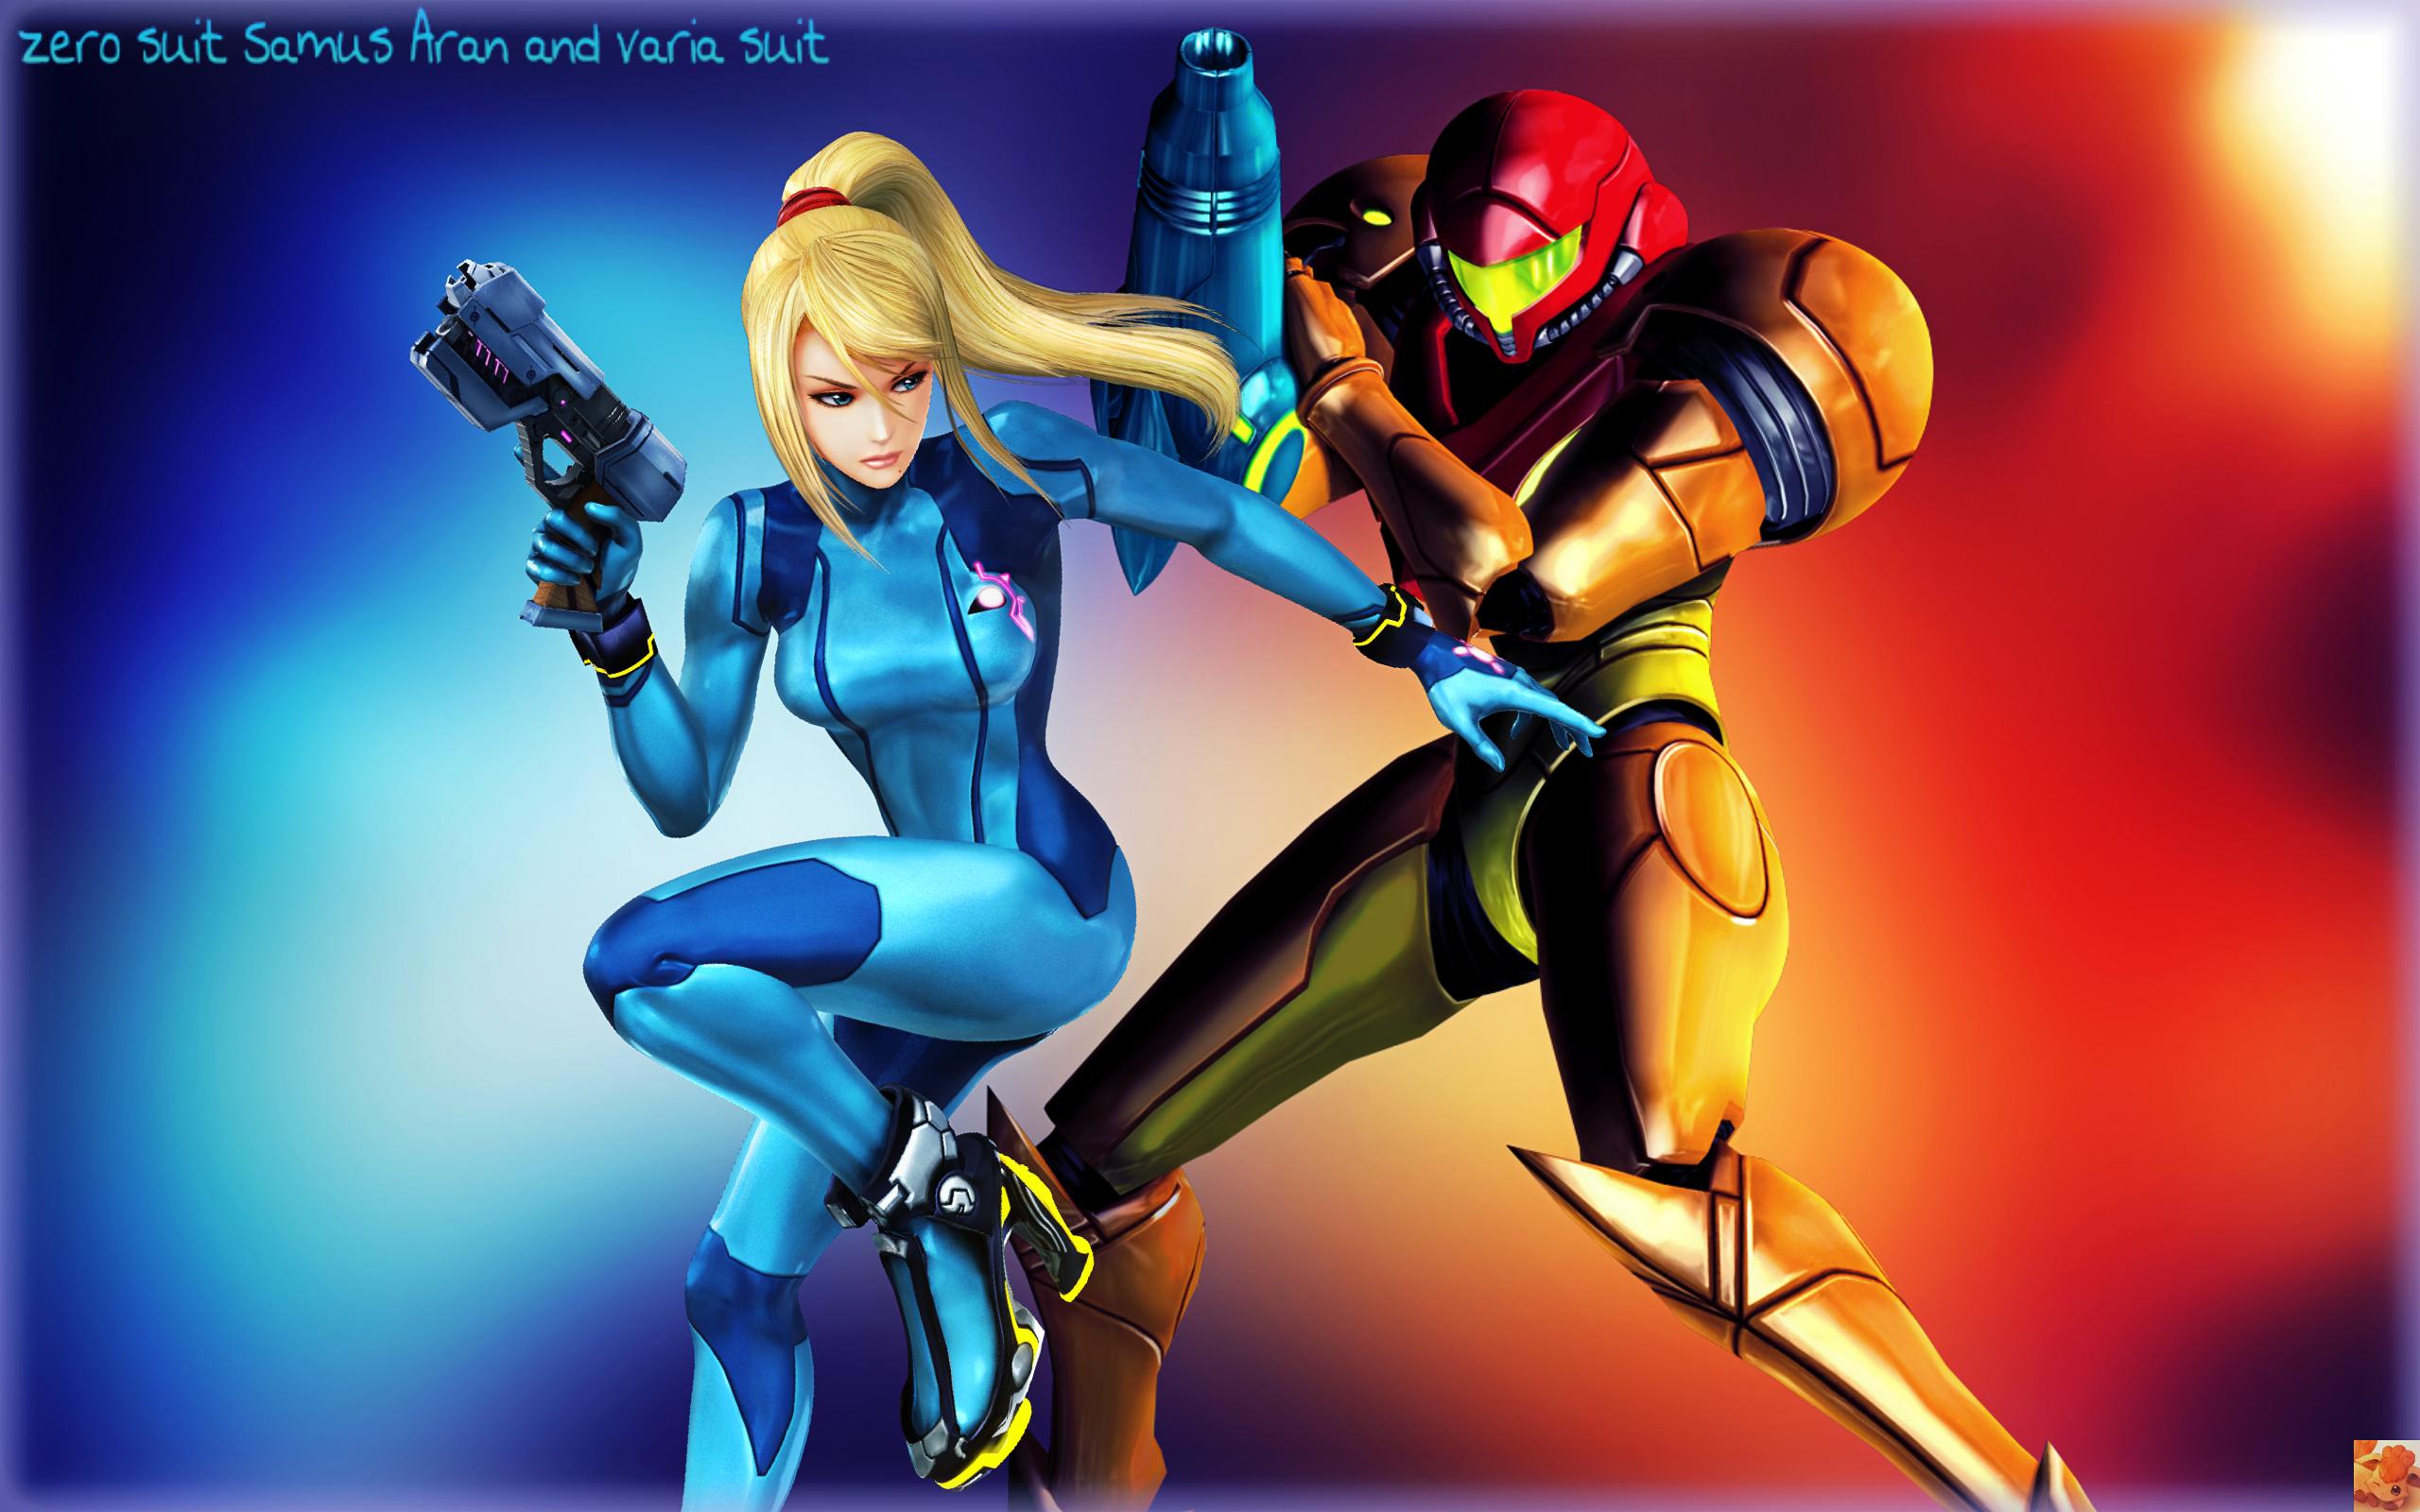 Metroid Samus Aran Zero Suit And Varia Suit By Firefox4x On Deviantart